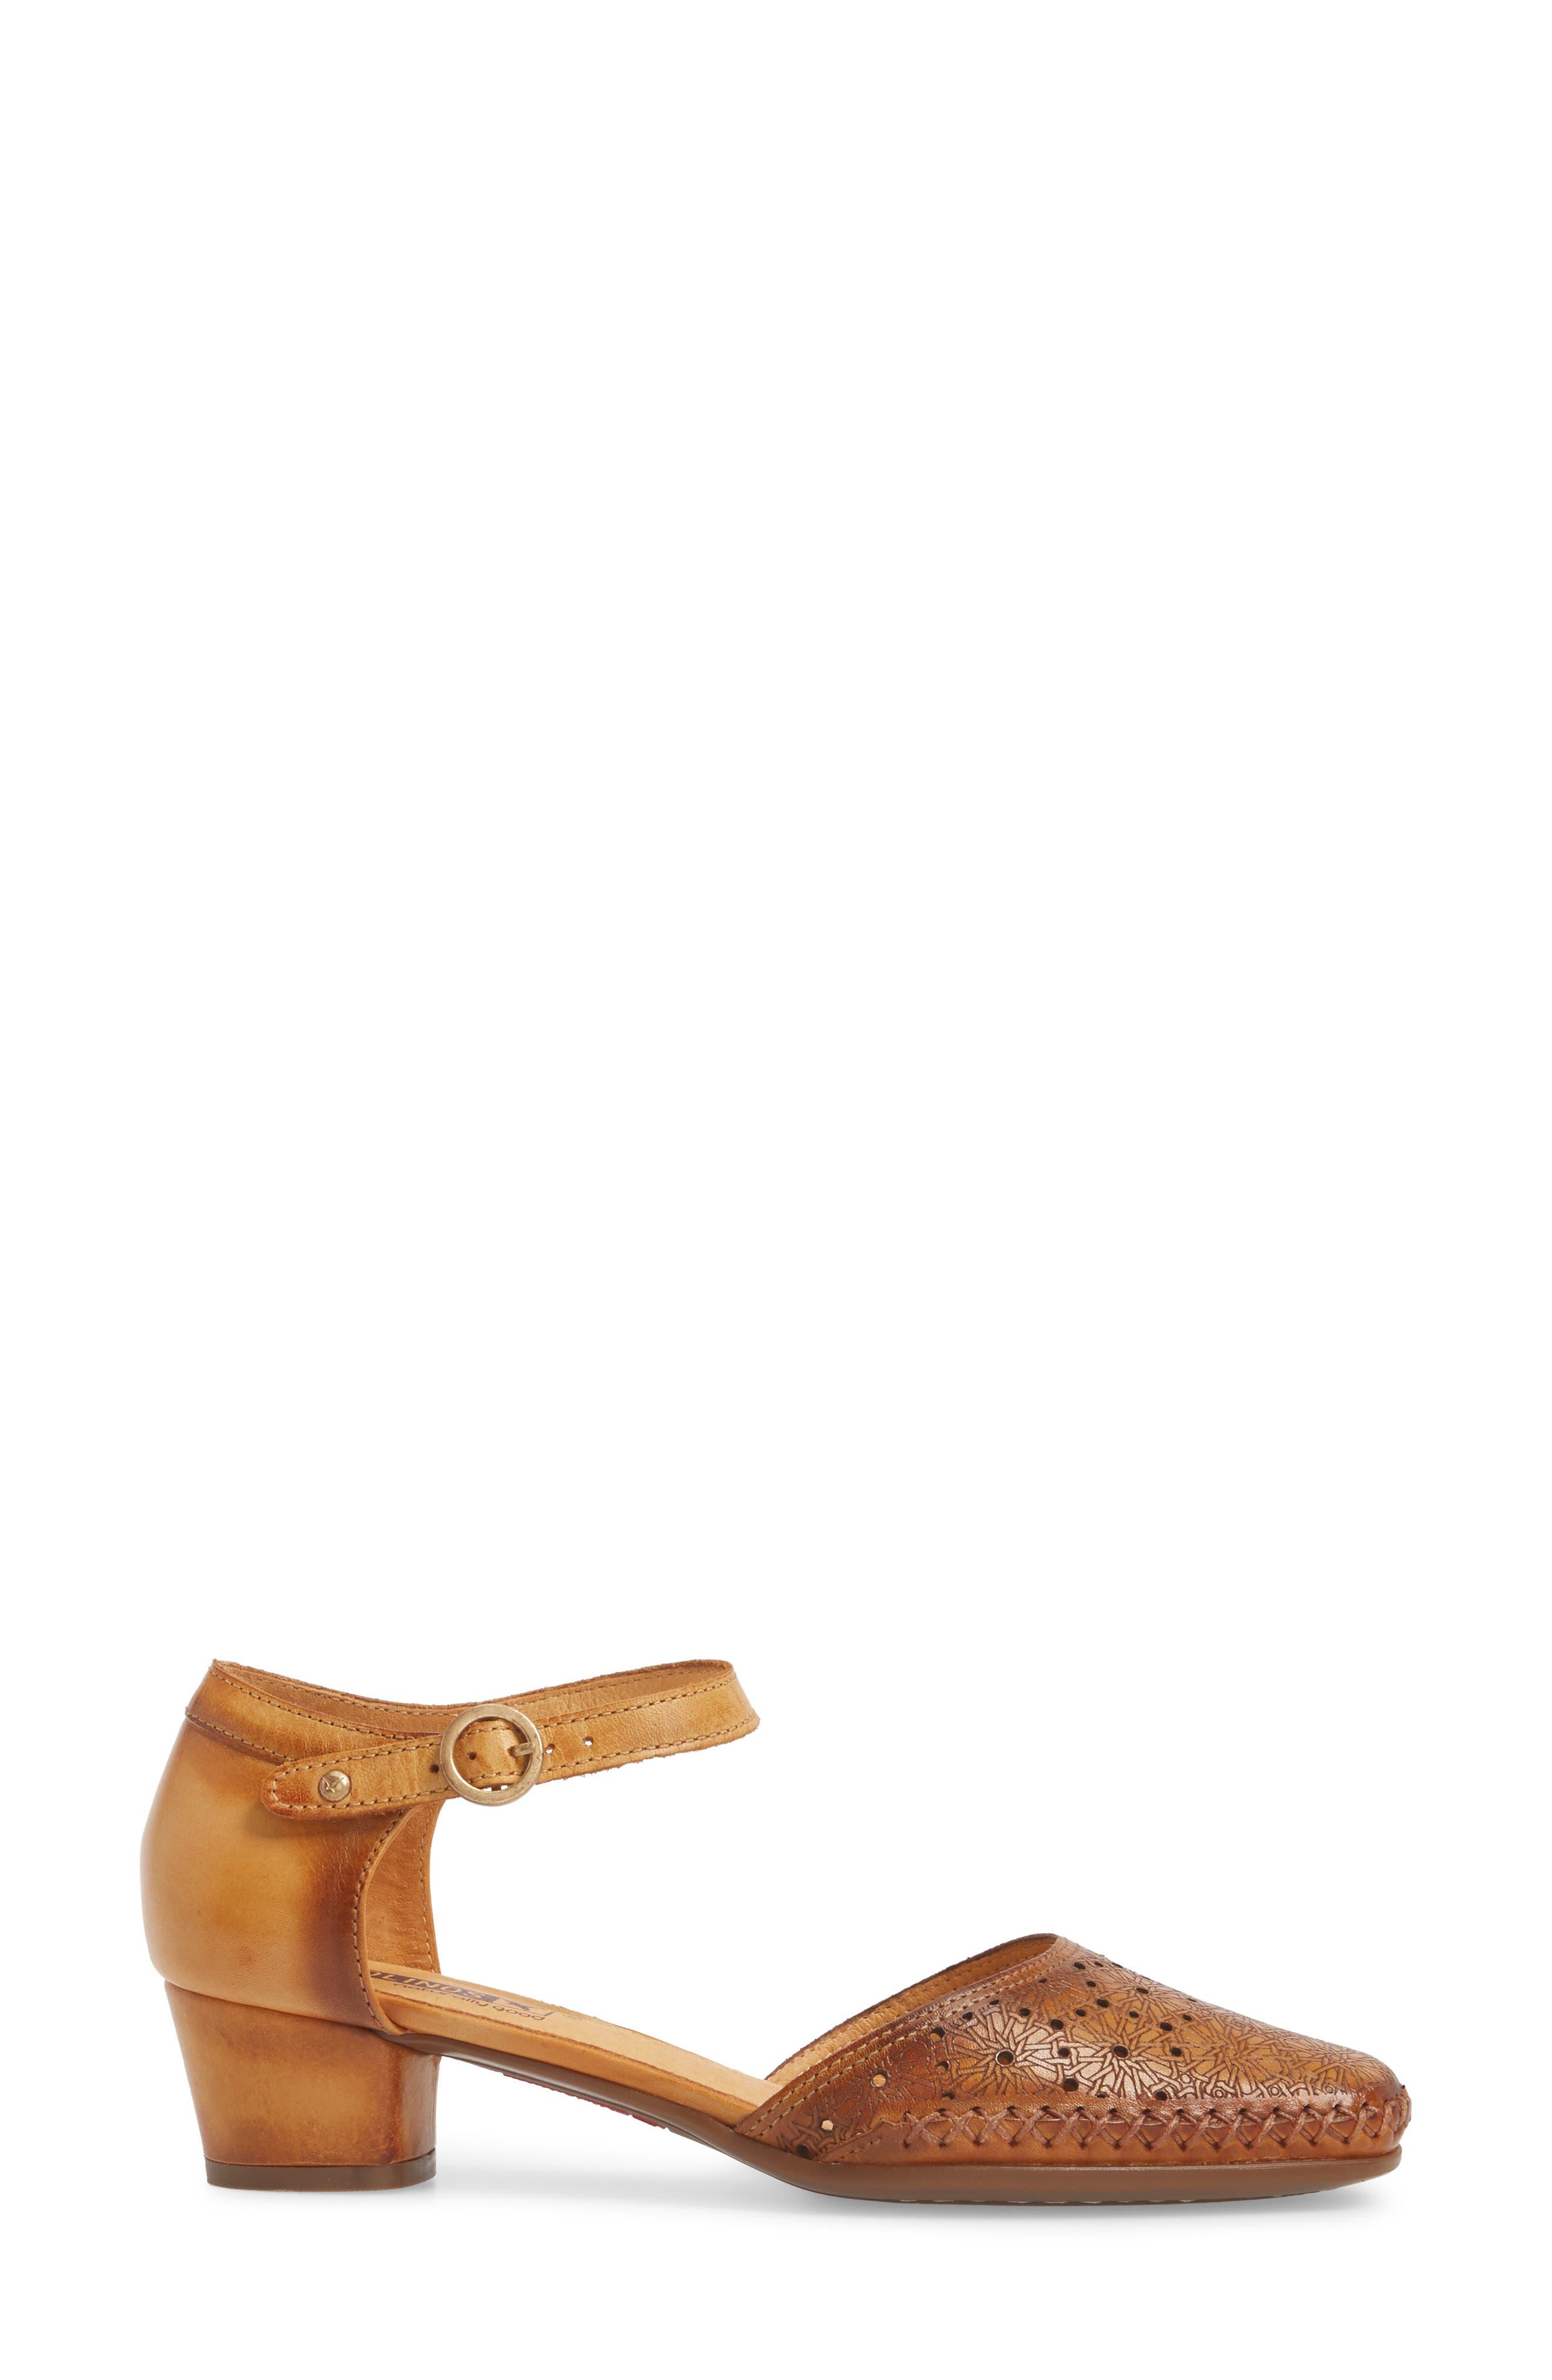 Gomera Pump,                             Alternate thumbnail 3, color,                             Lava Leather